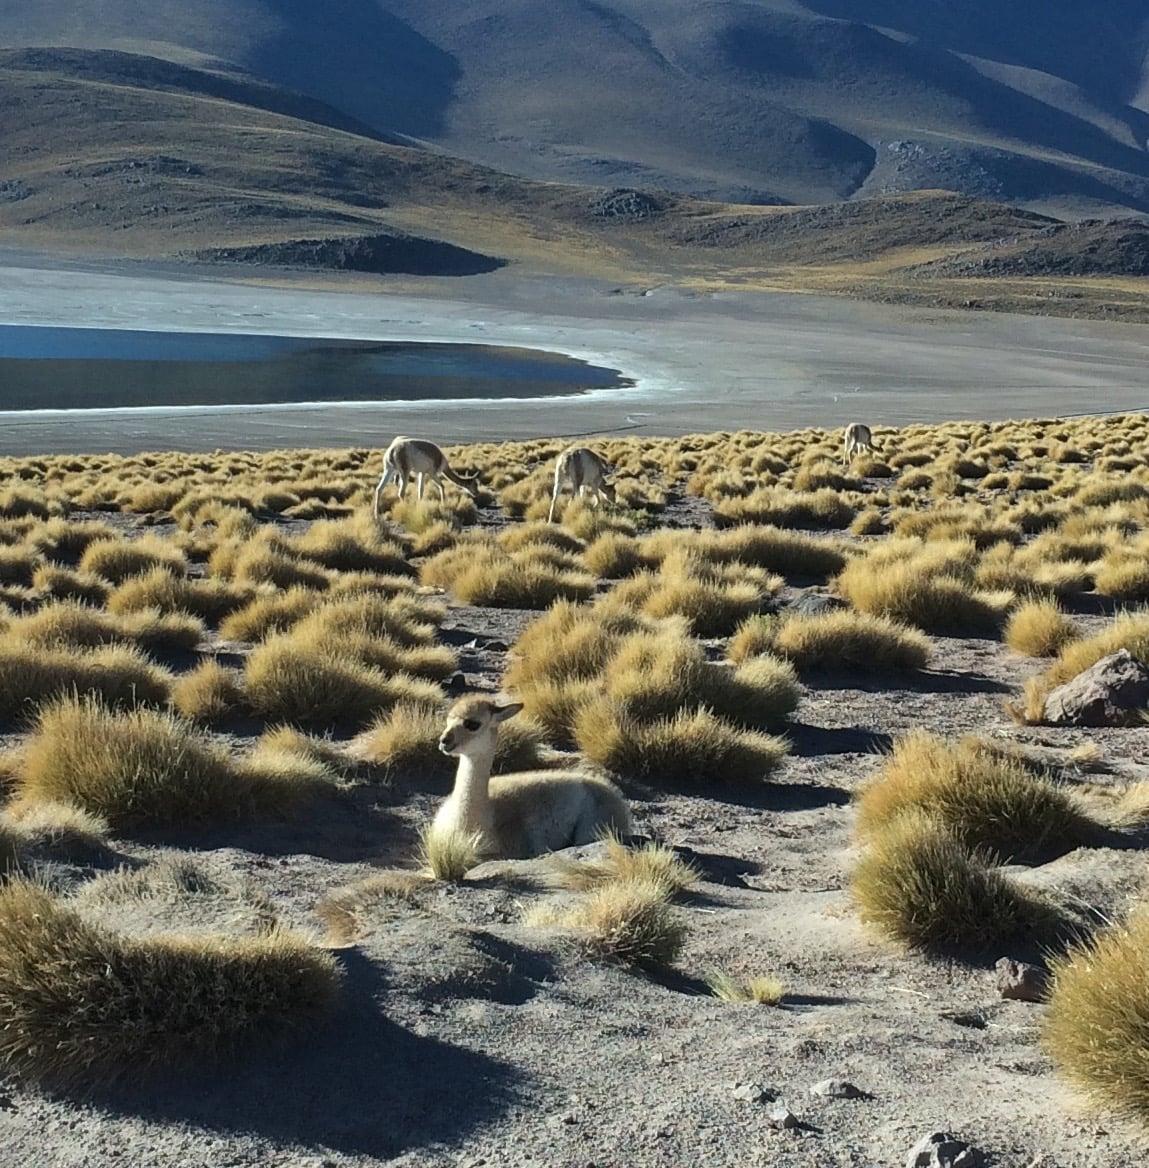 Vicuña, Altiplano Atacama Chile - 3 Days*